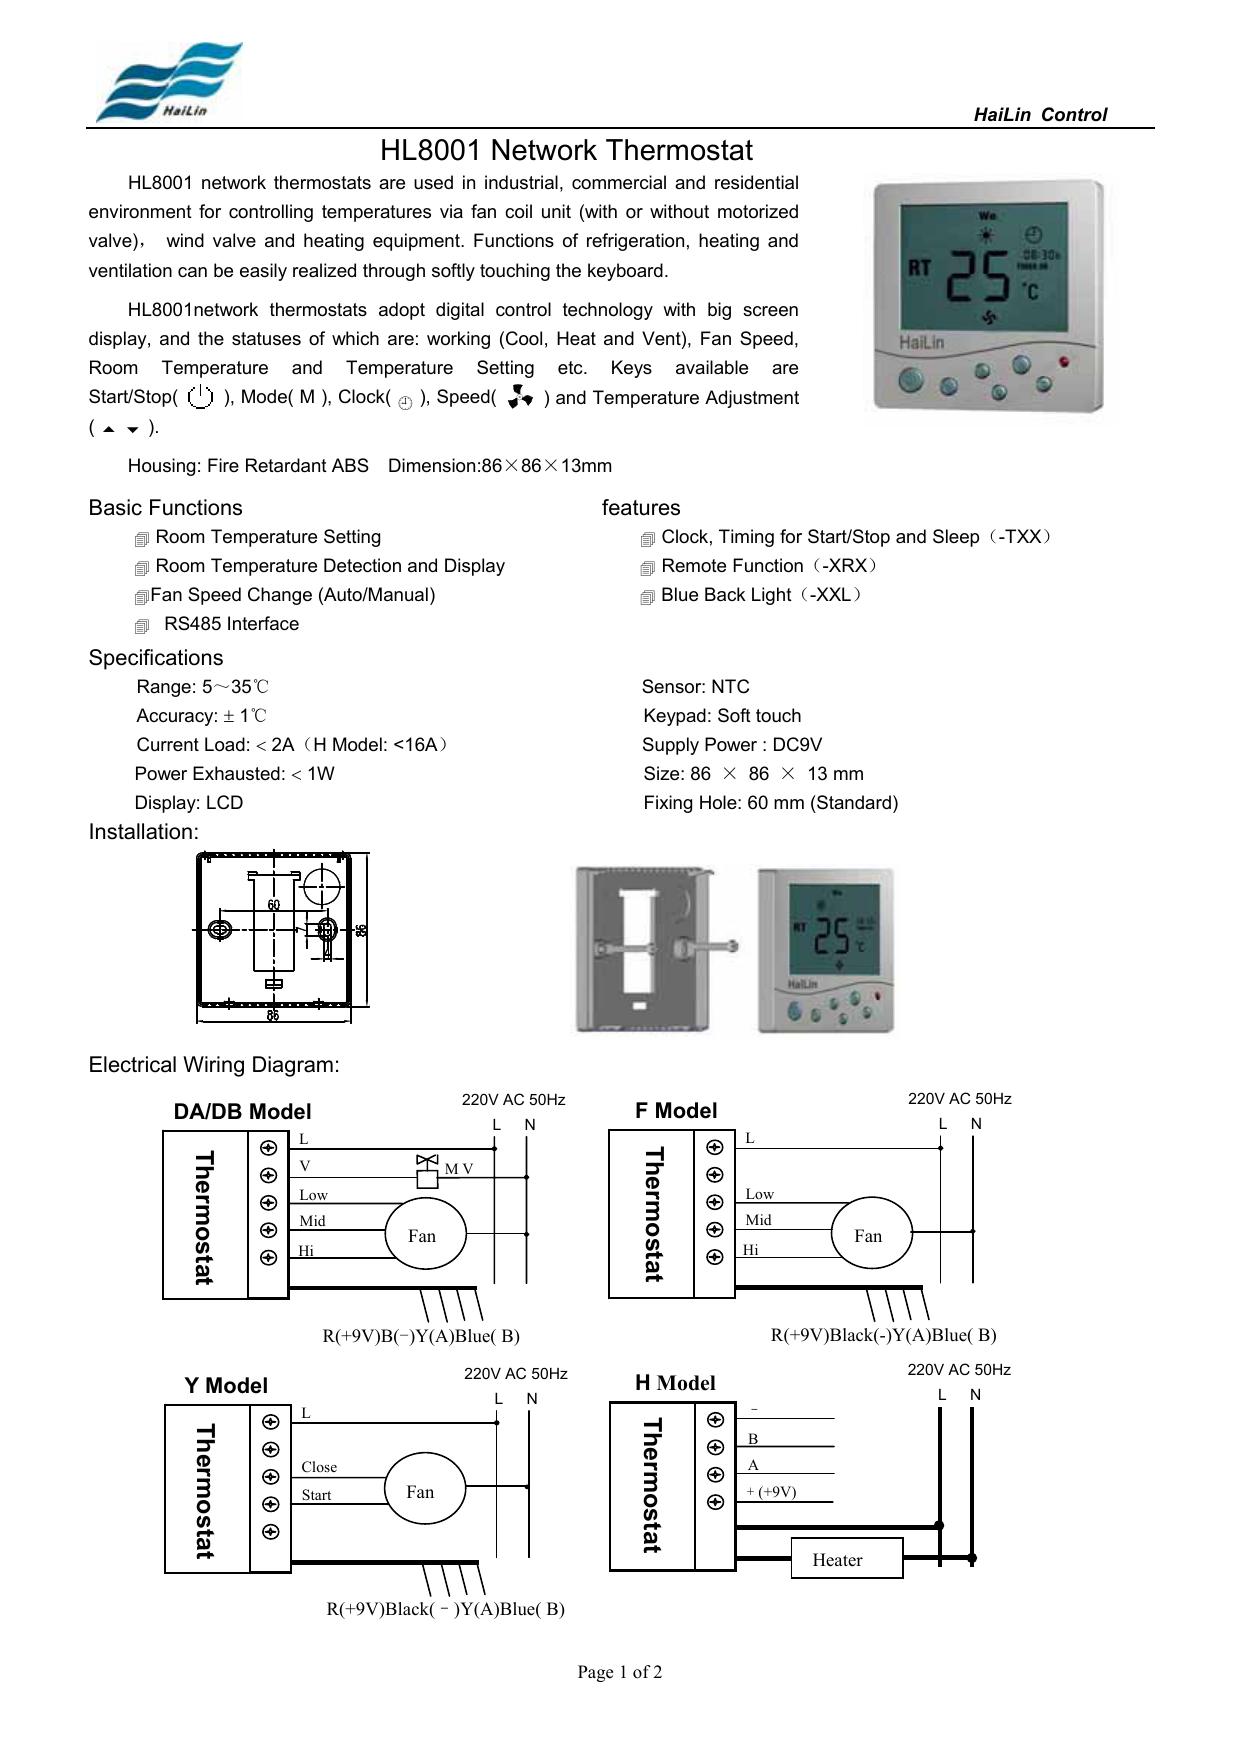 HL8001 Network Thermostat | manualzz.com on